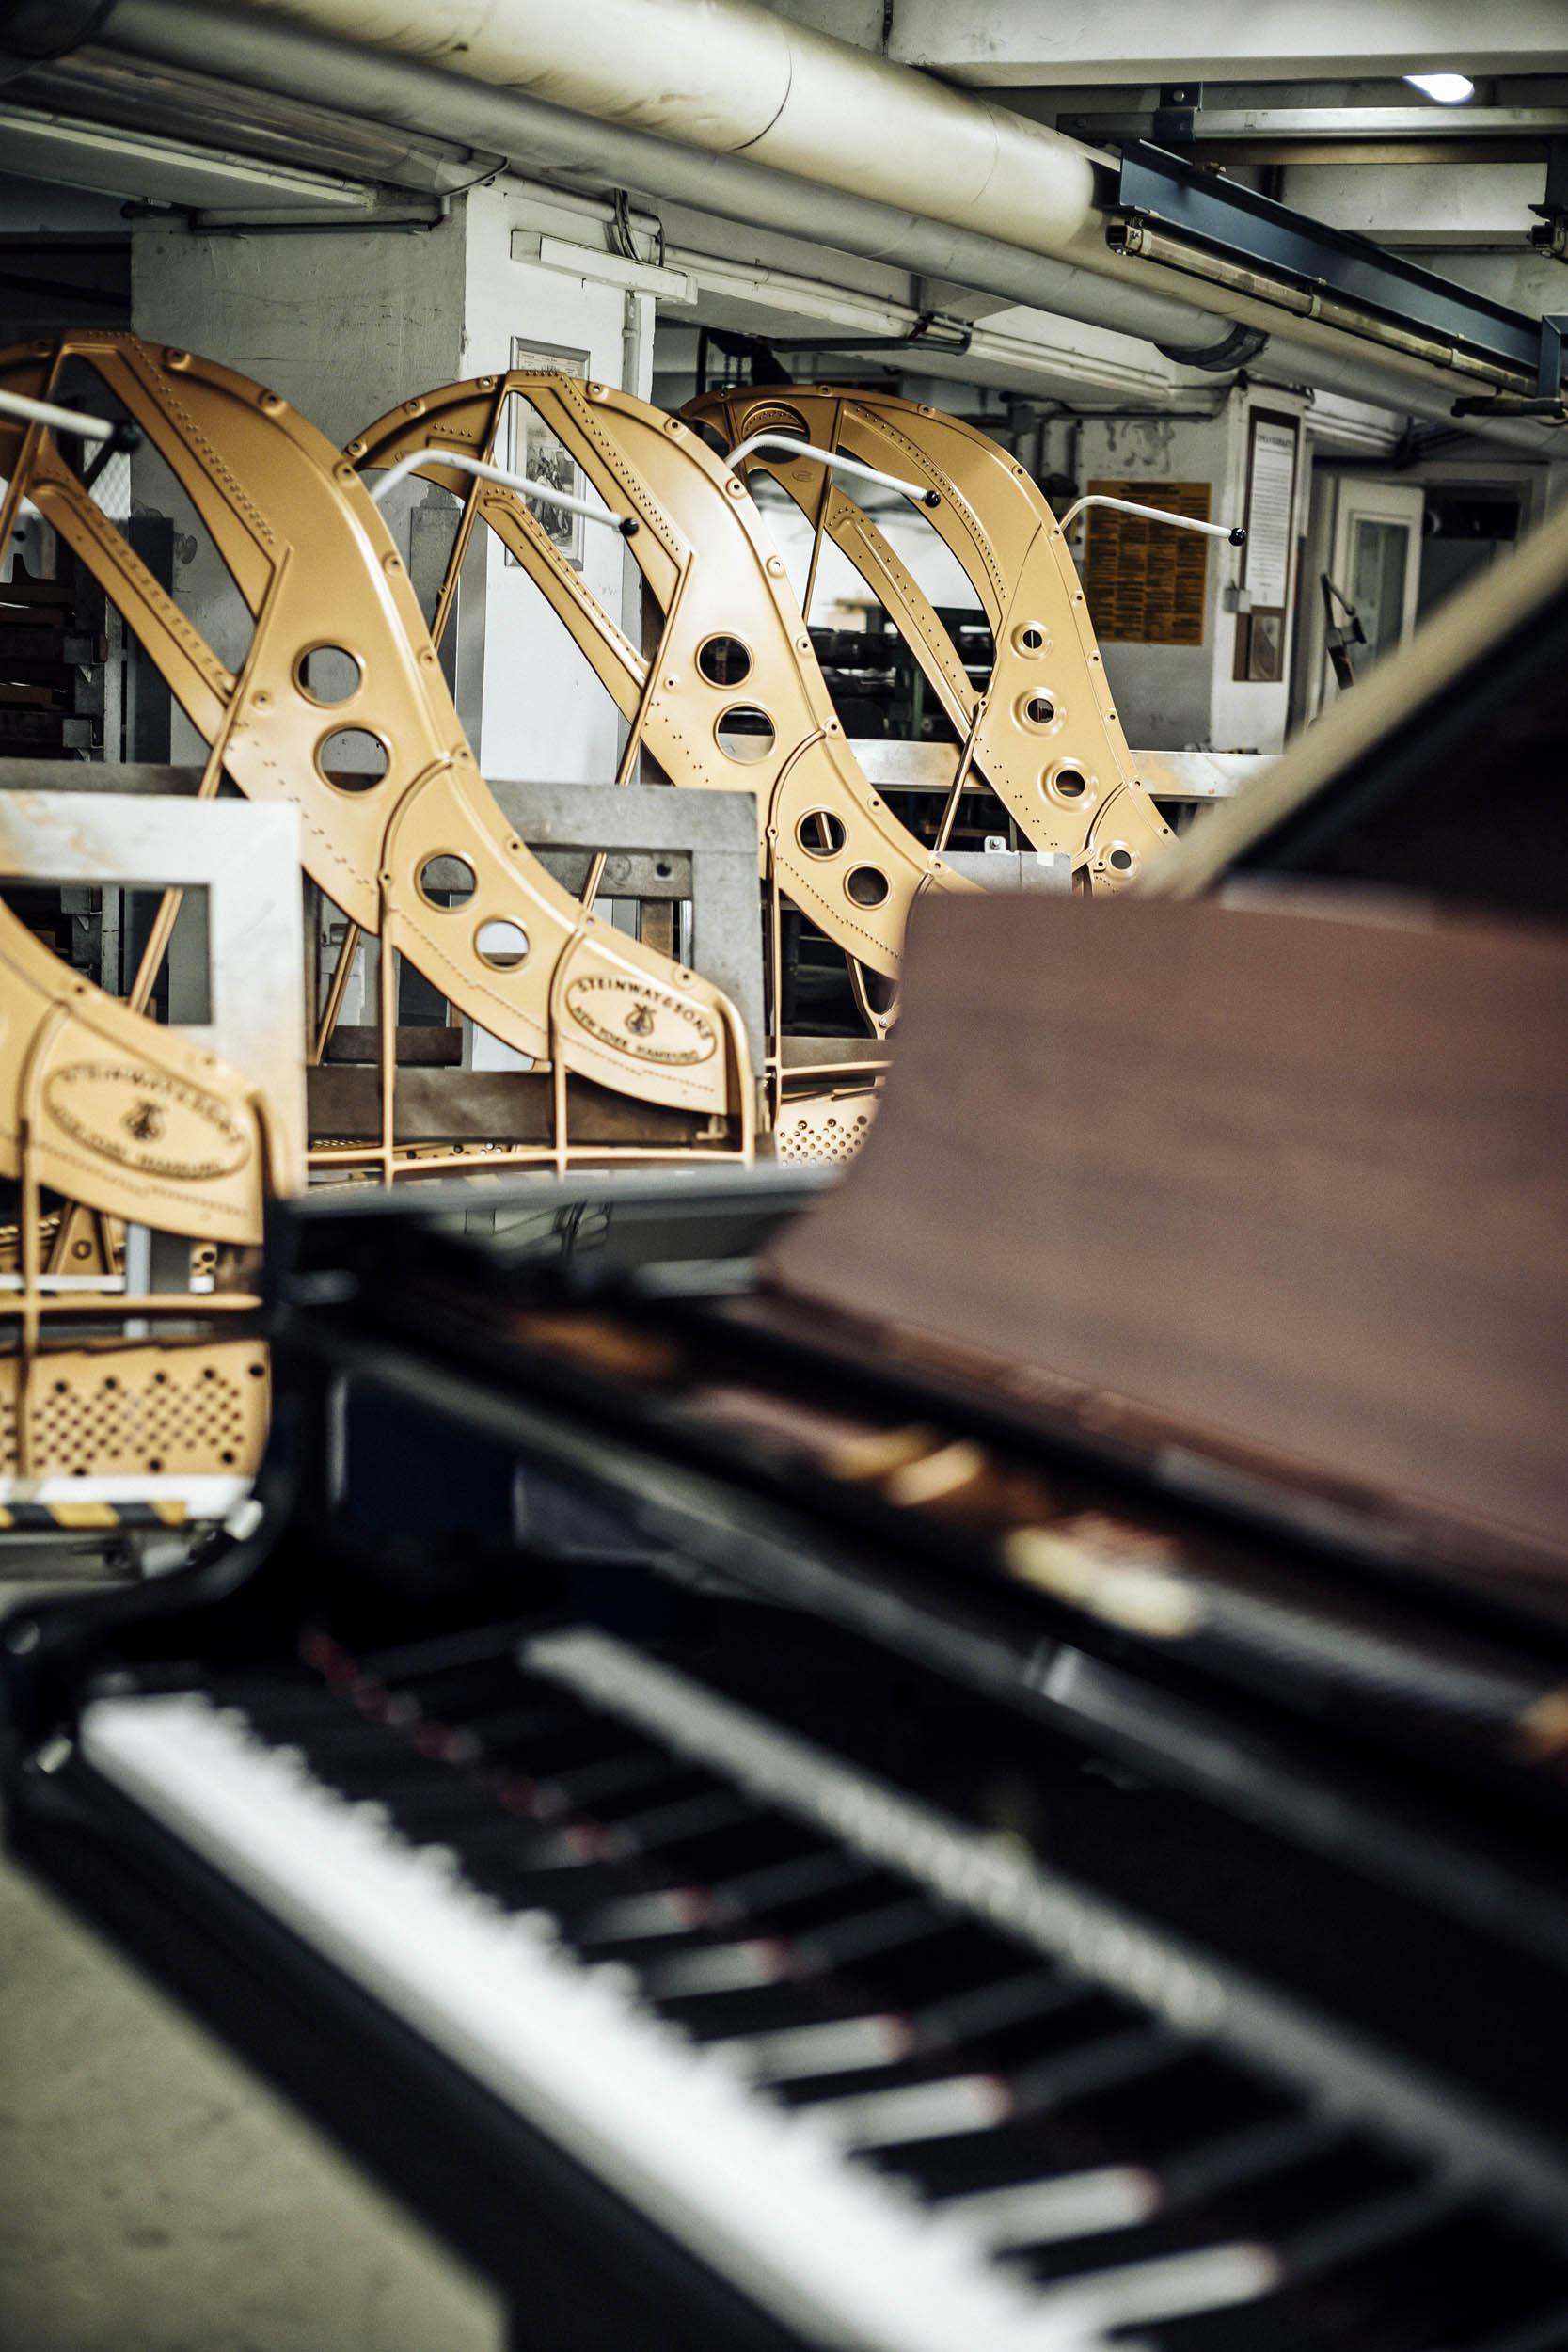 2019-SeifertUebler-steinway-piano-006.jpg